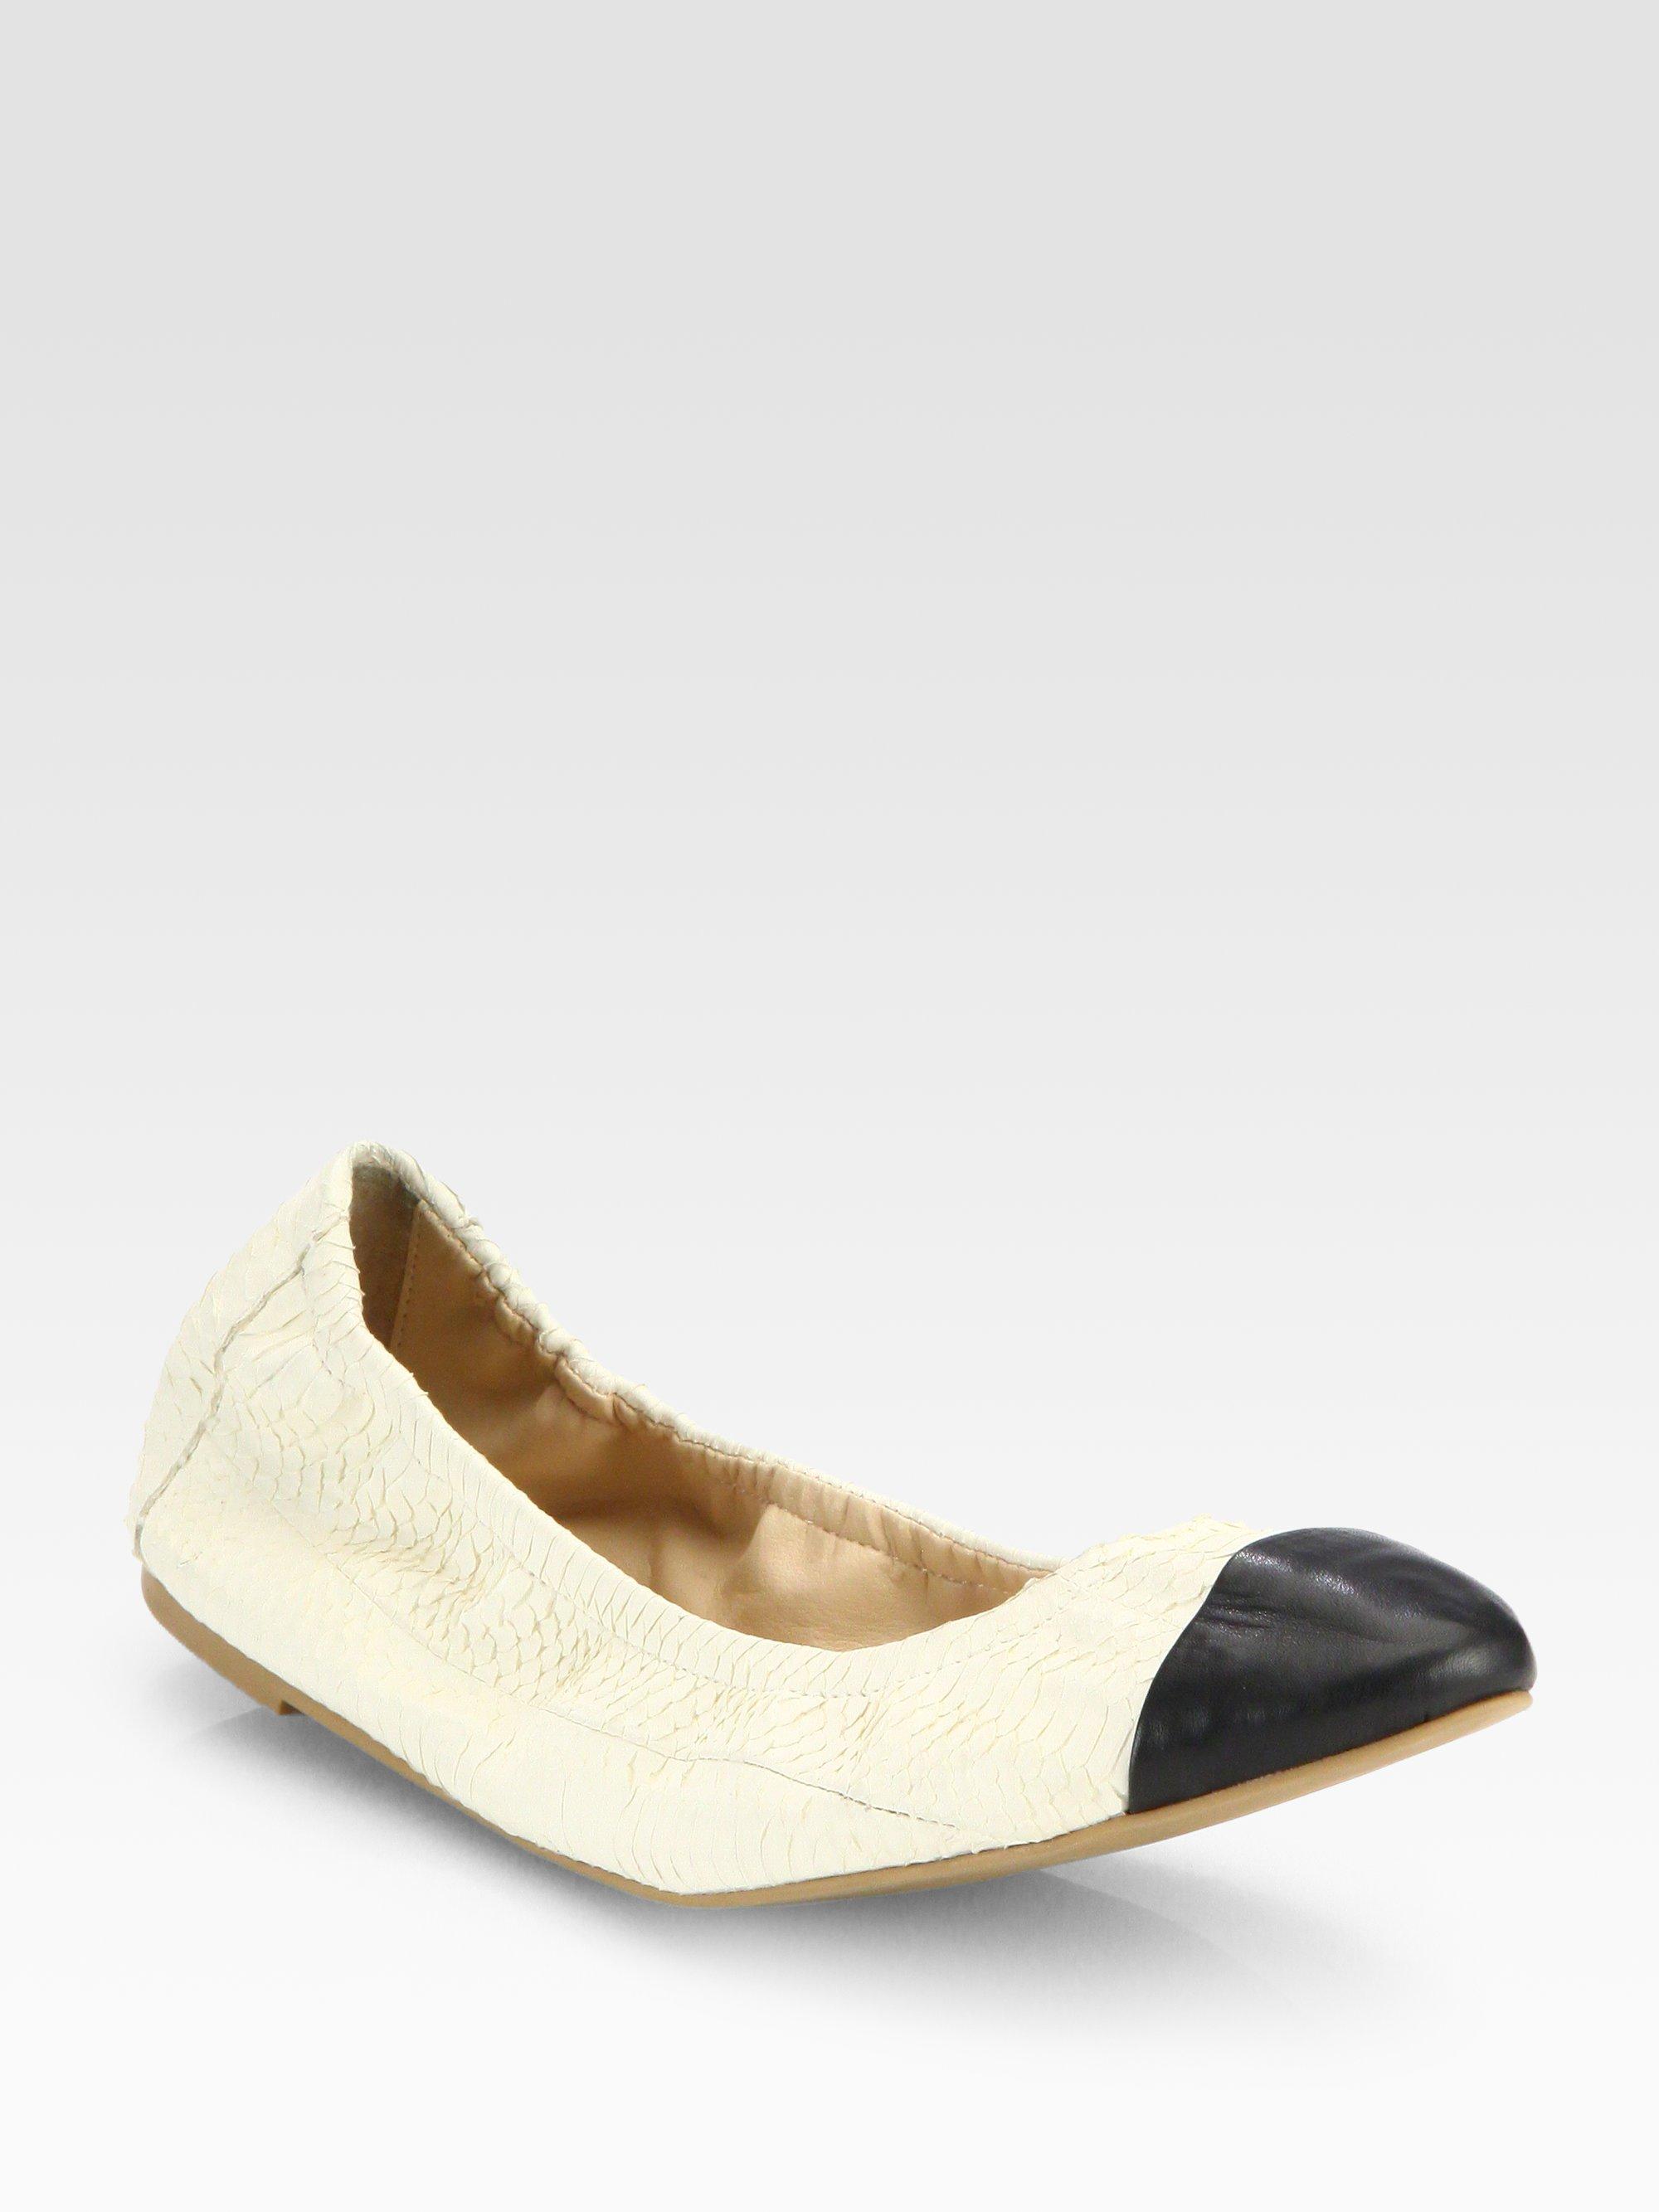 Loeffler Randall Leather Ballet Flats discount top quality s6bXPrMz